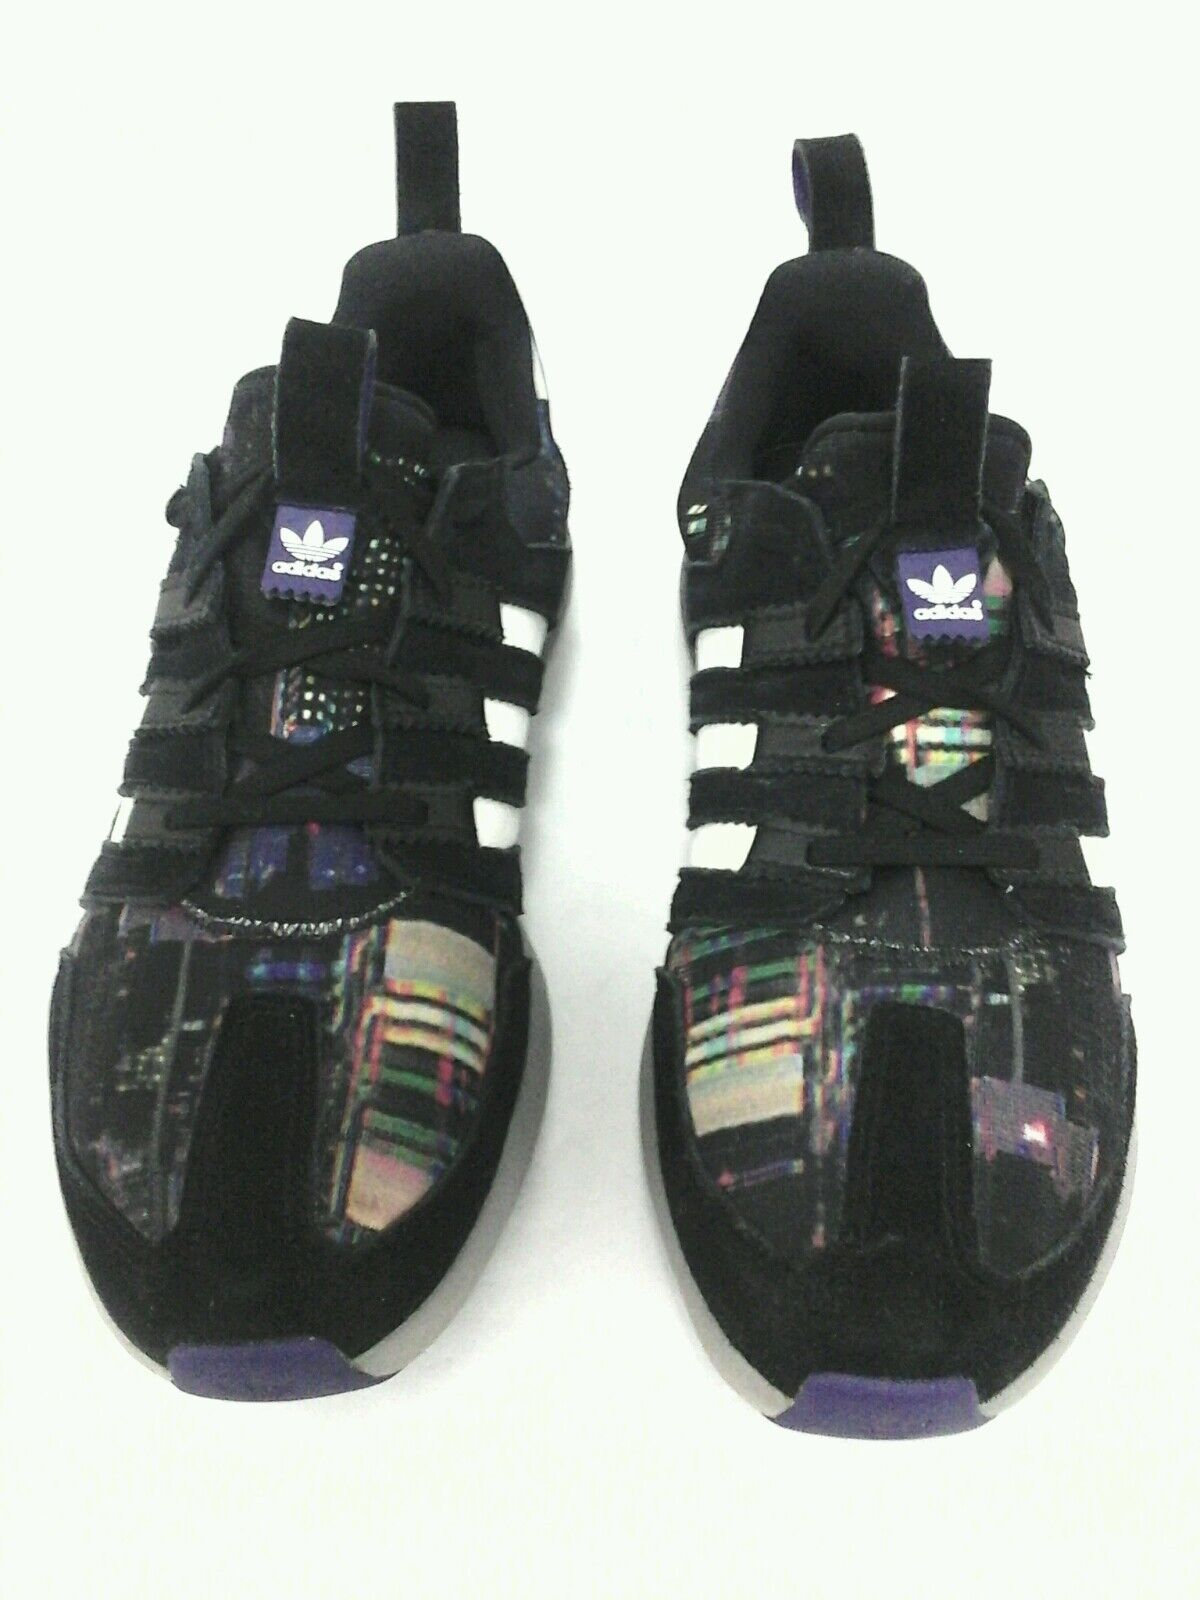 best service 3d403 b3c68 ADIDAS Chaussures SL Loop Runner Noir Multi Baskets femmes femmes femmes  Multi   Jolie Et Colorée